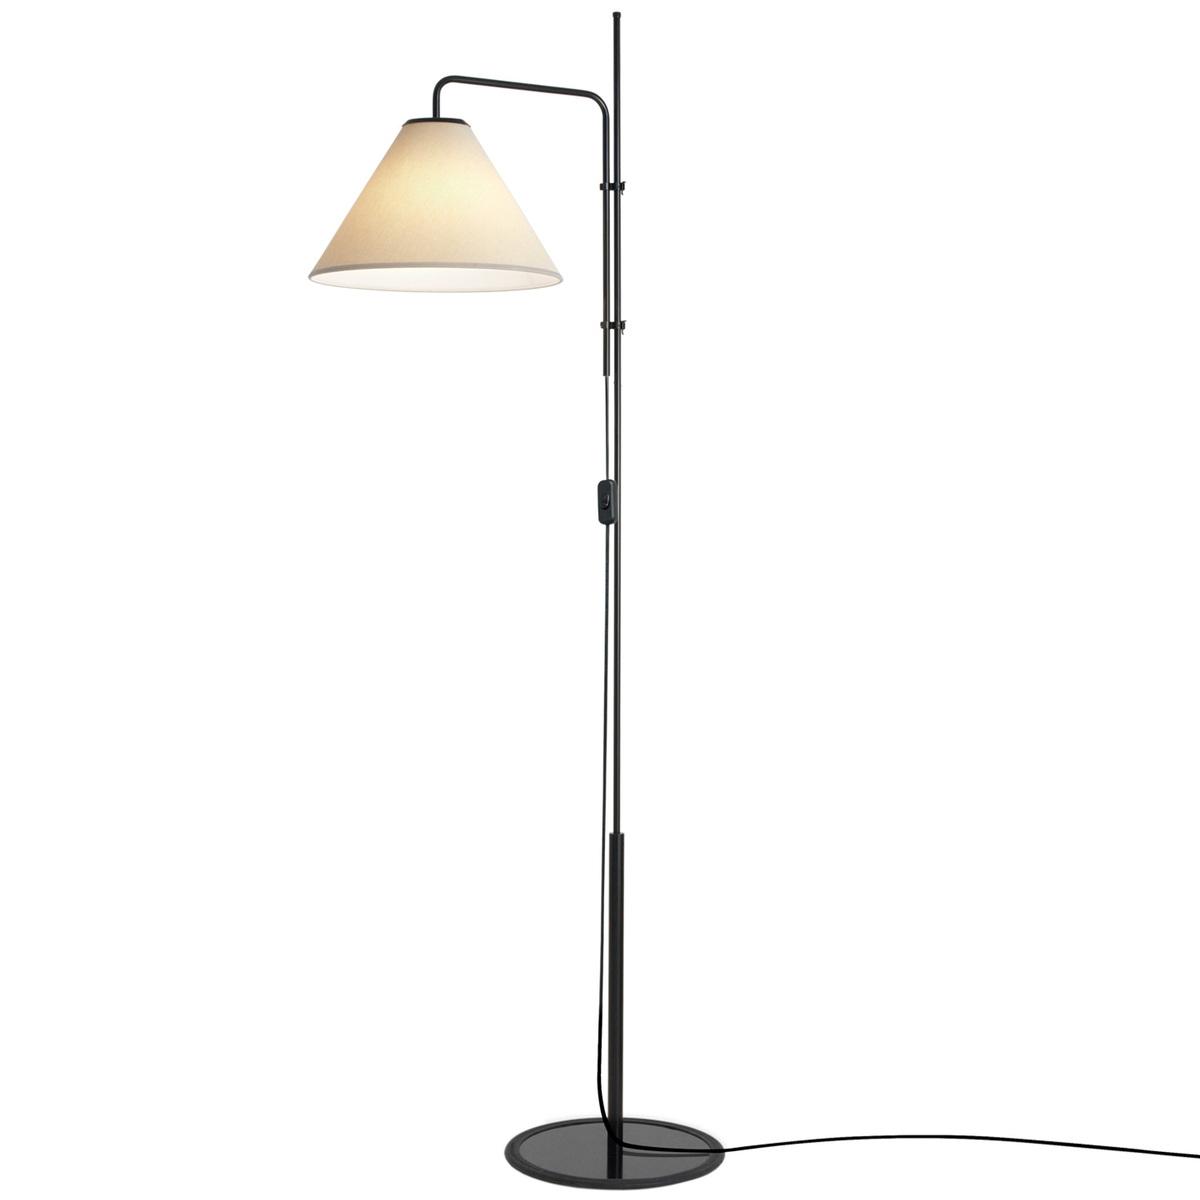 Marset Funiculi Fabric Floor Lamp, Black - Sand